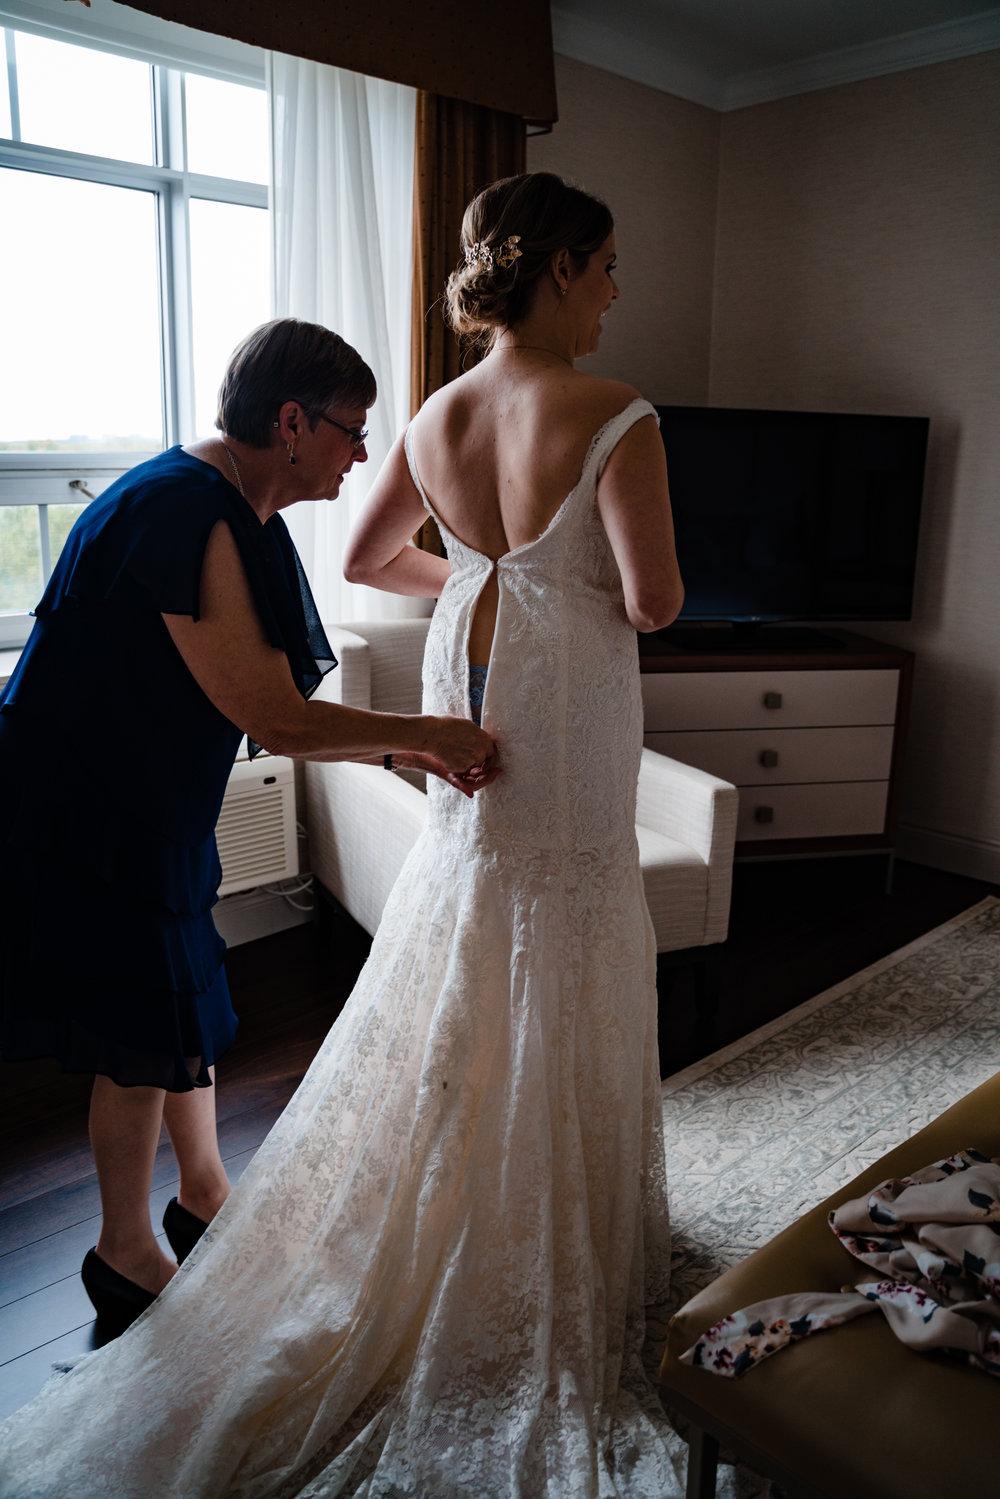 Waegwoltic-Halifax-Wedding-venue-novascotia-ottawa-ontario (39 of 141).jpg